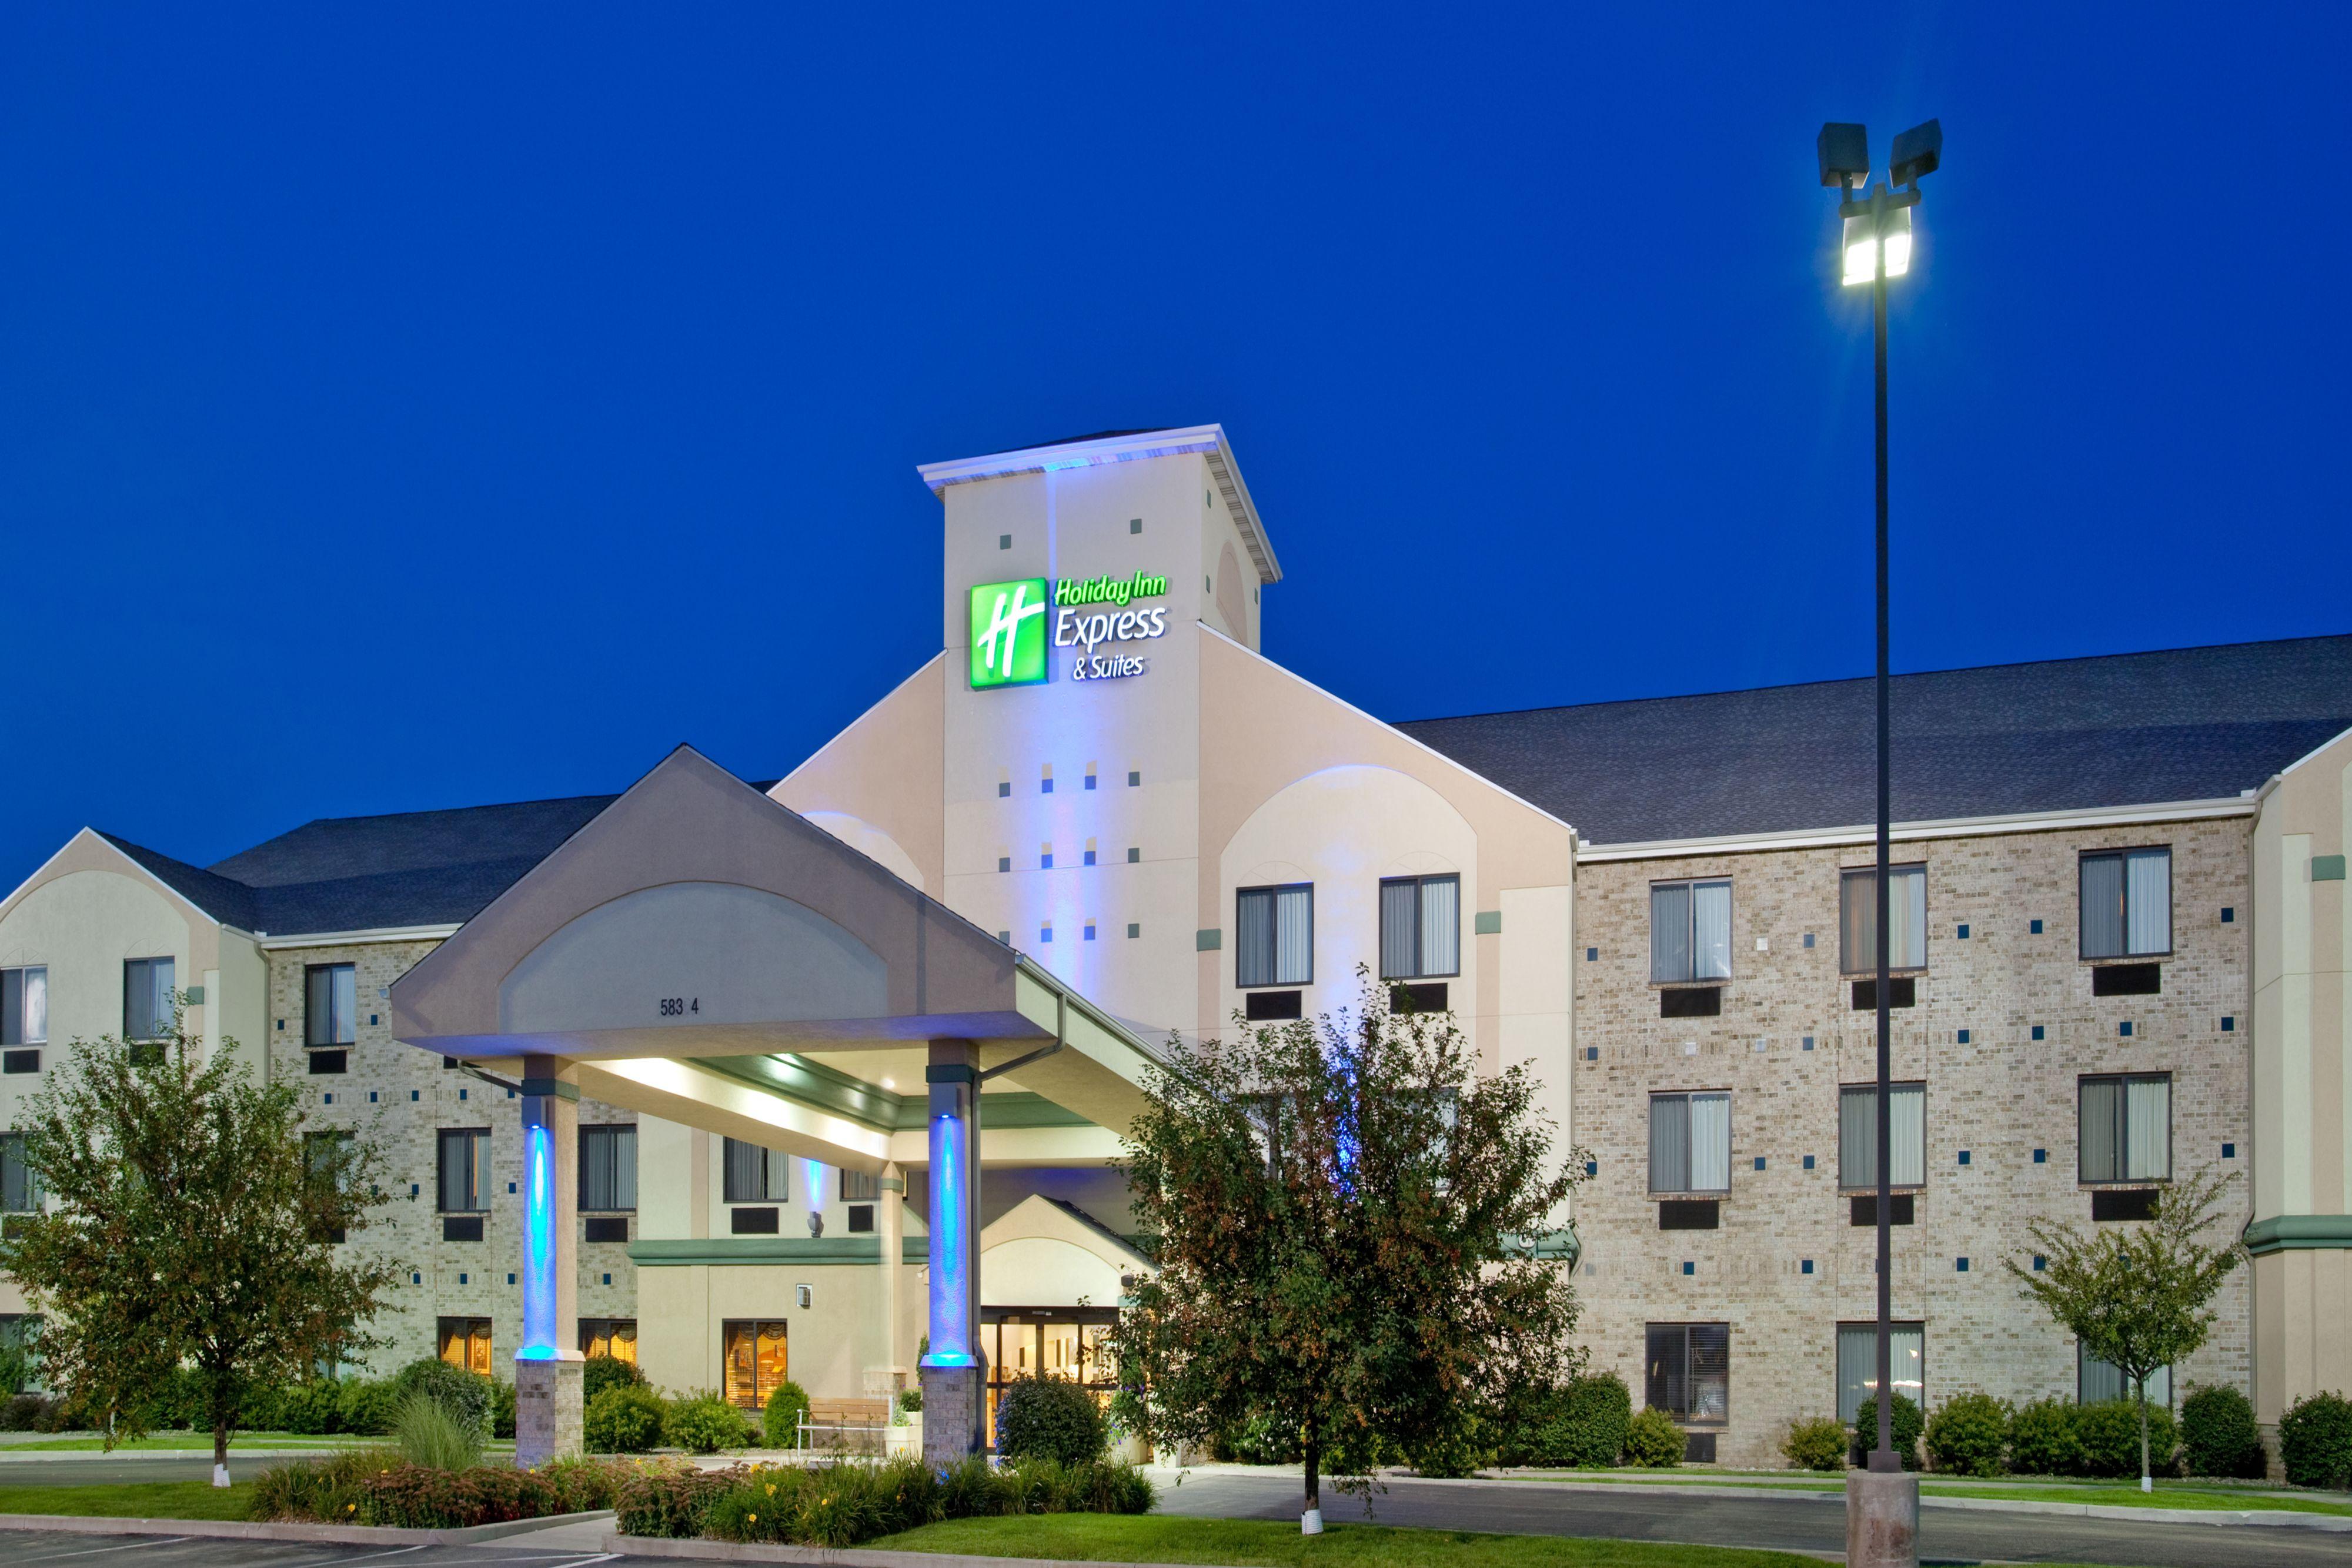 Holiday Inn Express & Suites Elk Grove Ctrl - Sacramento S image 5